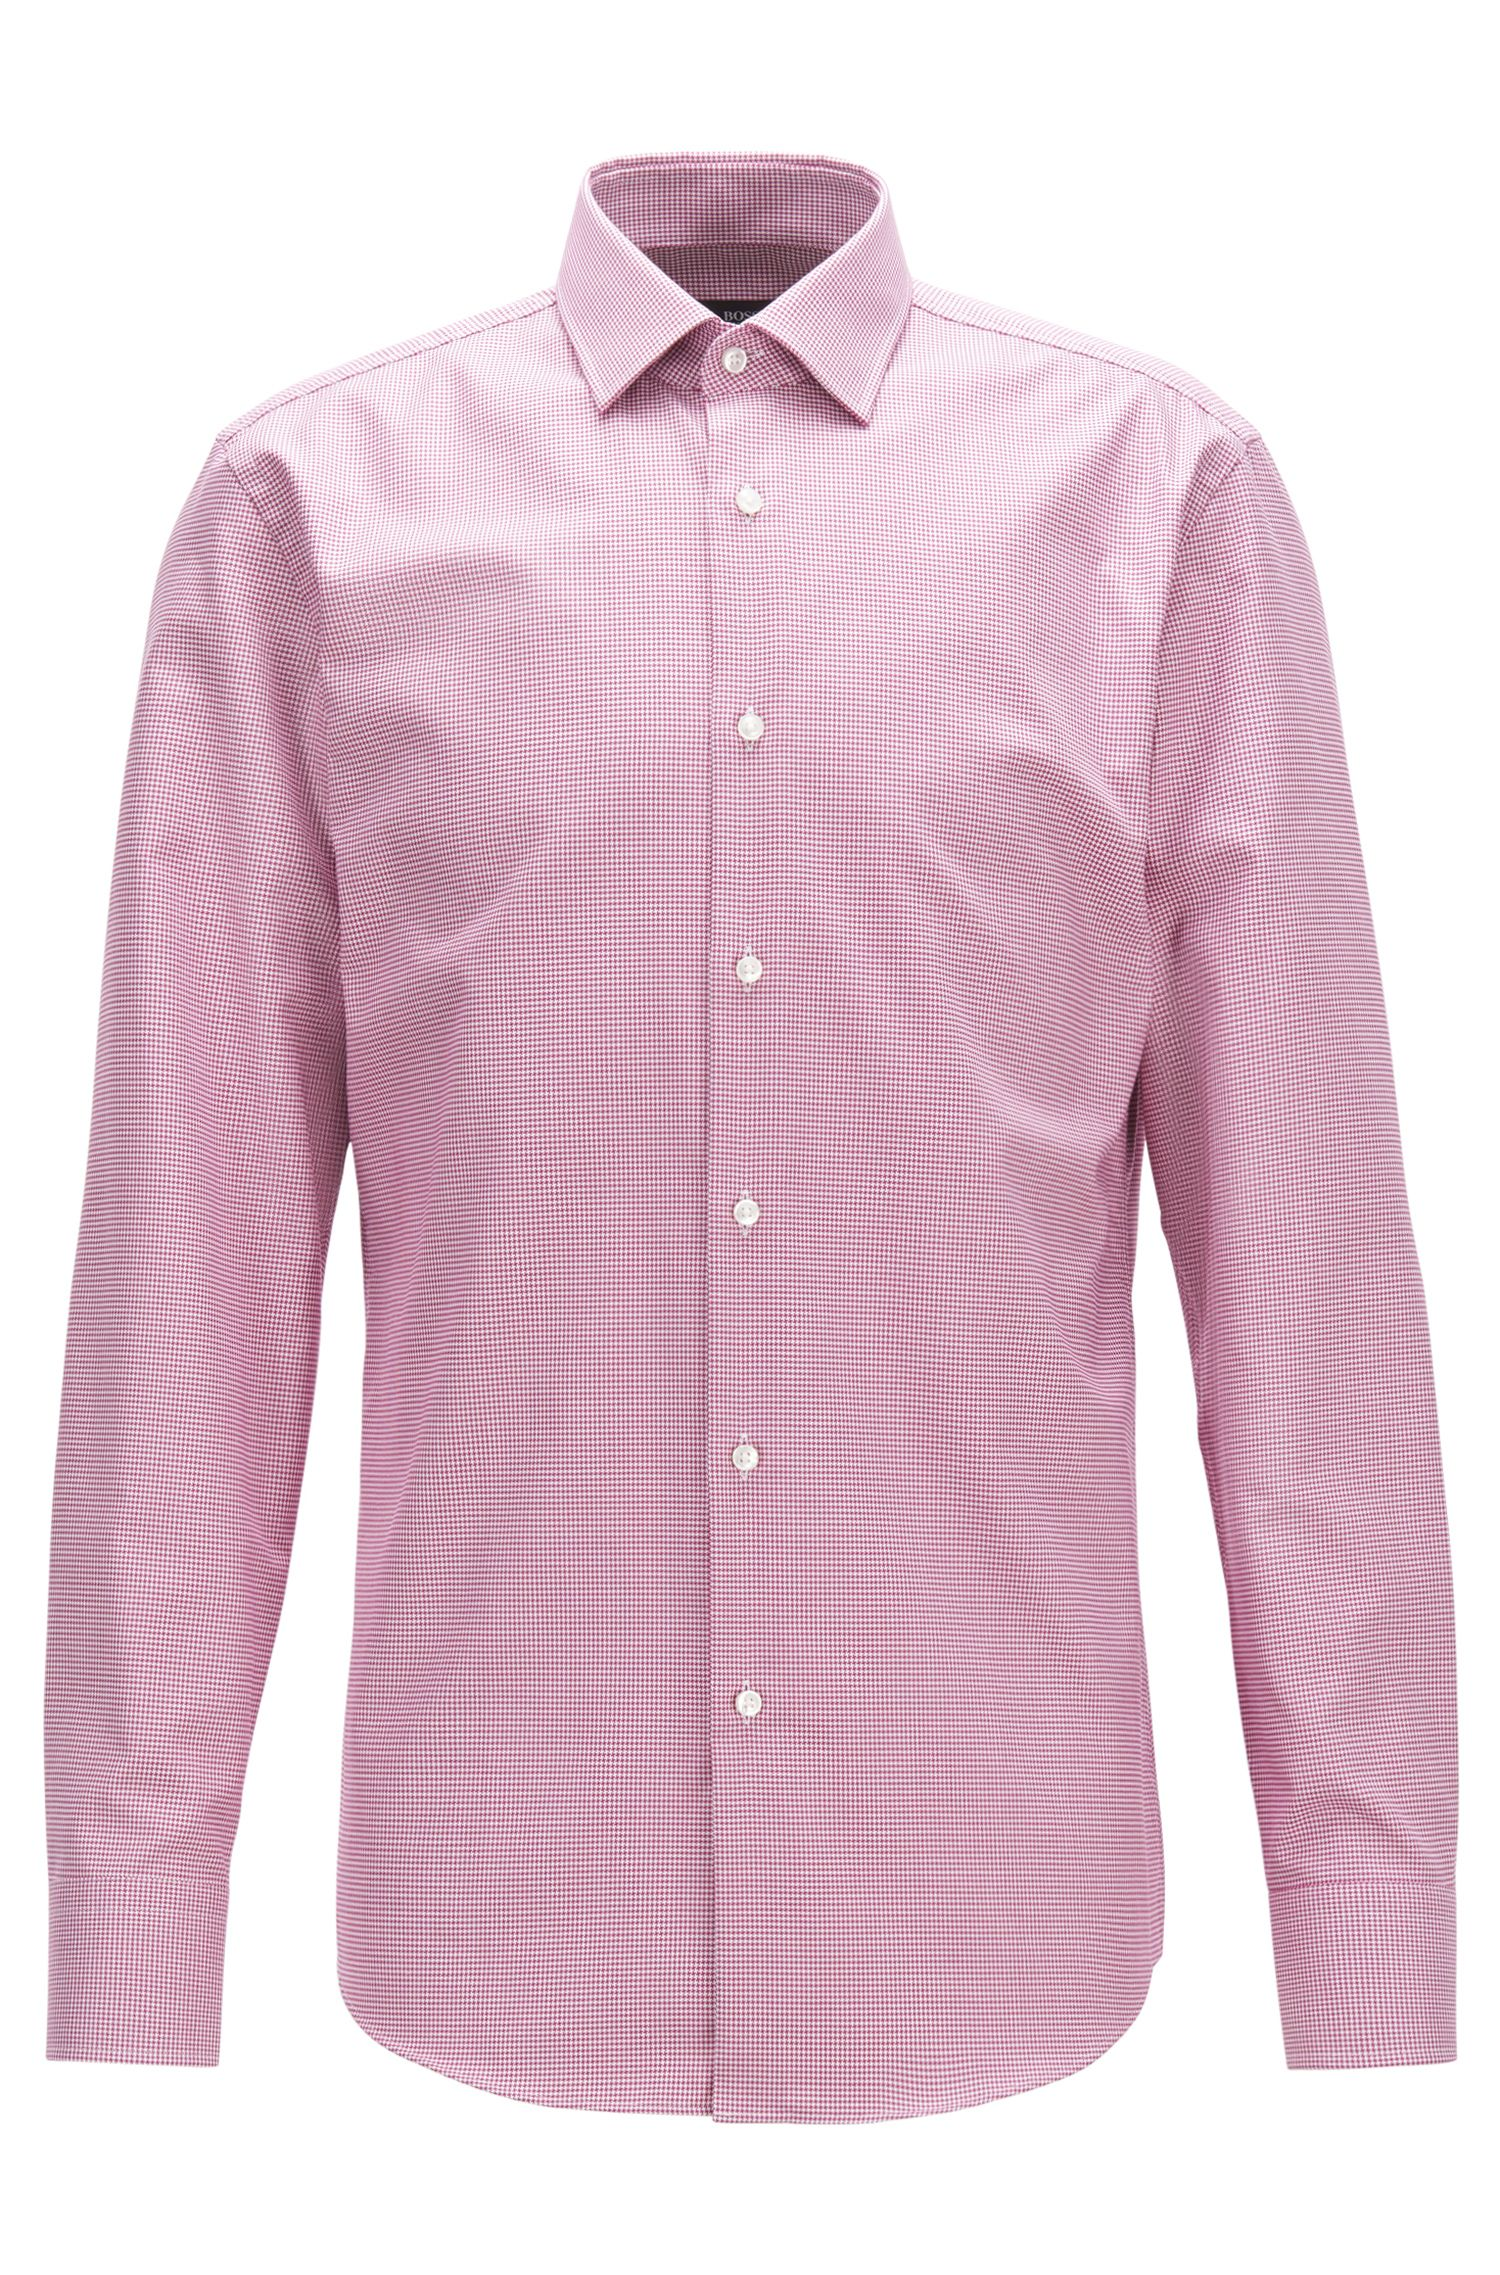 Puppytooth Cotton Dress Shirt, Slim Fit | Jenno